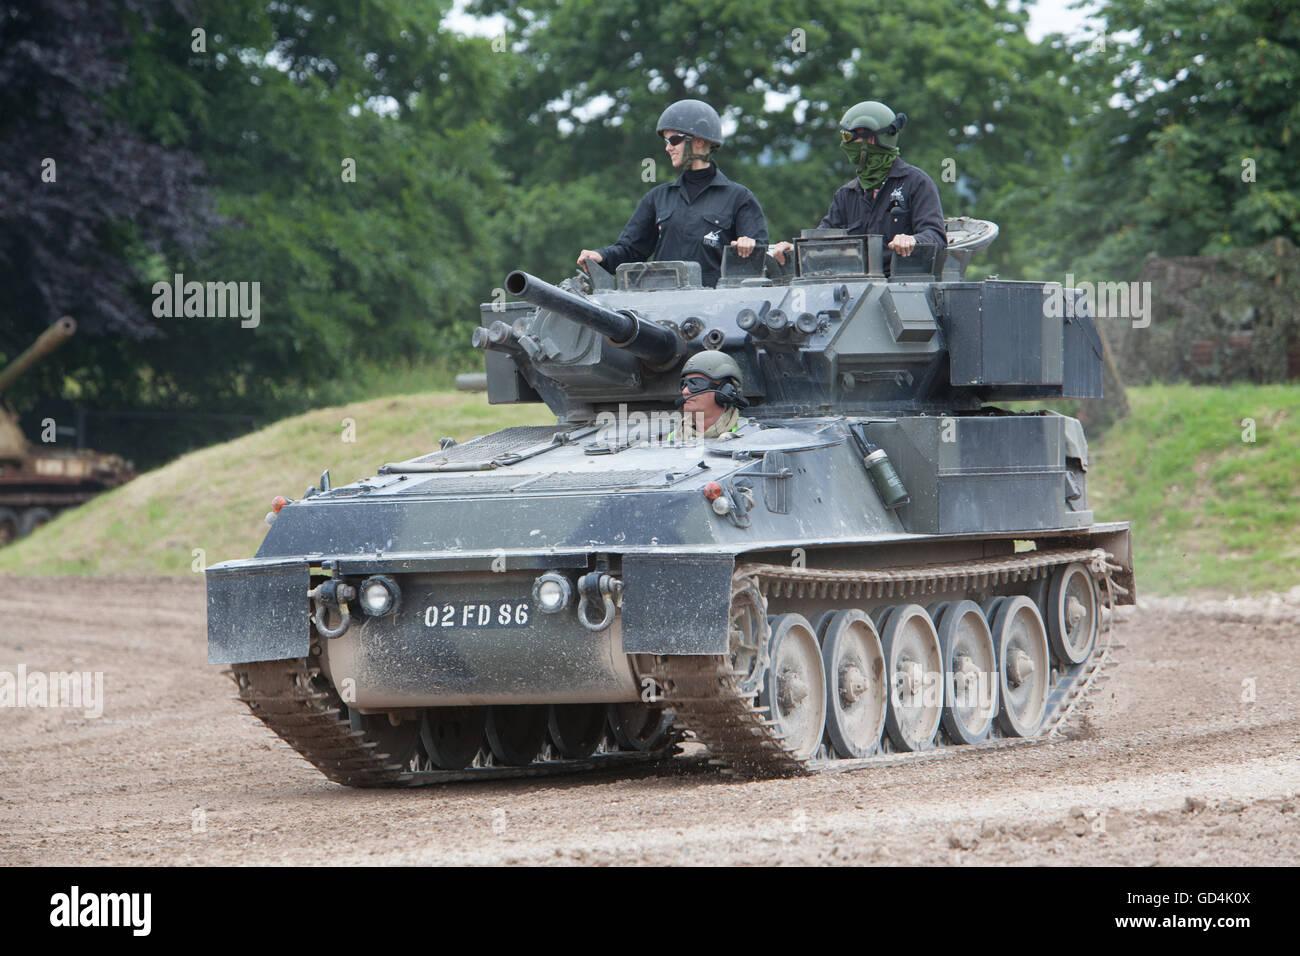 Tankfest, bovington, 2016 CVR(T) Scorpion Tank - Stock Image